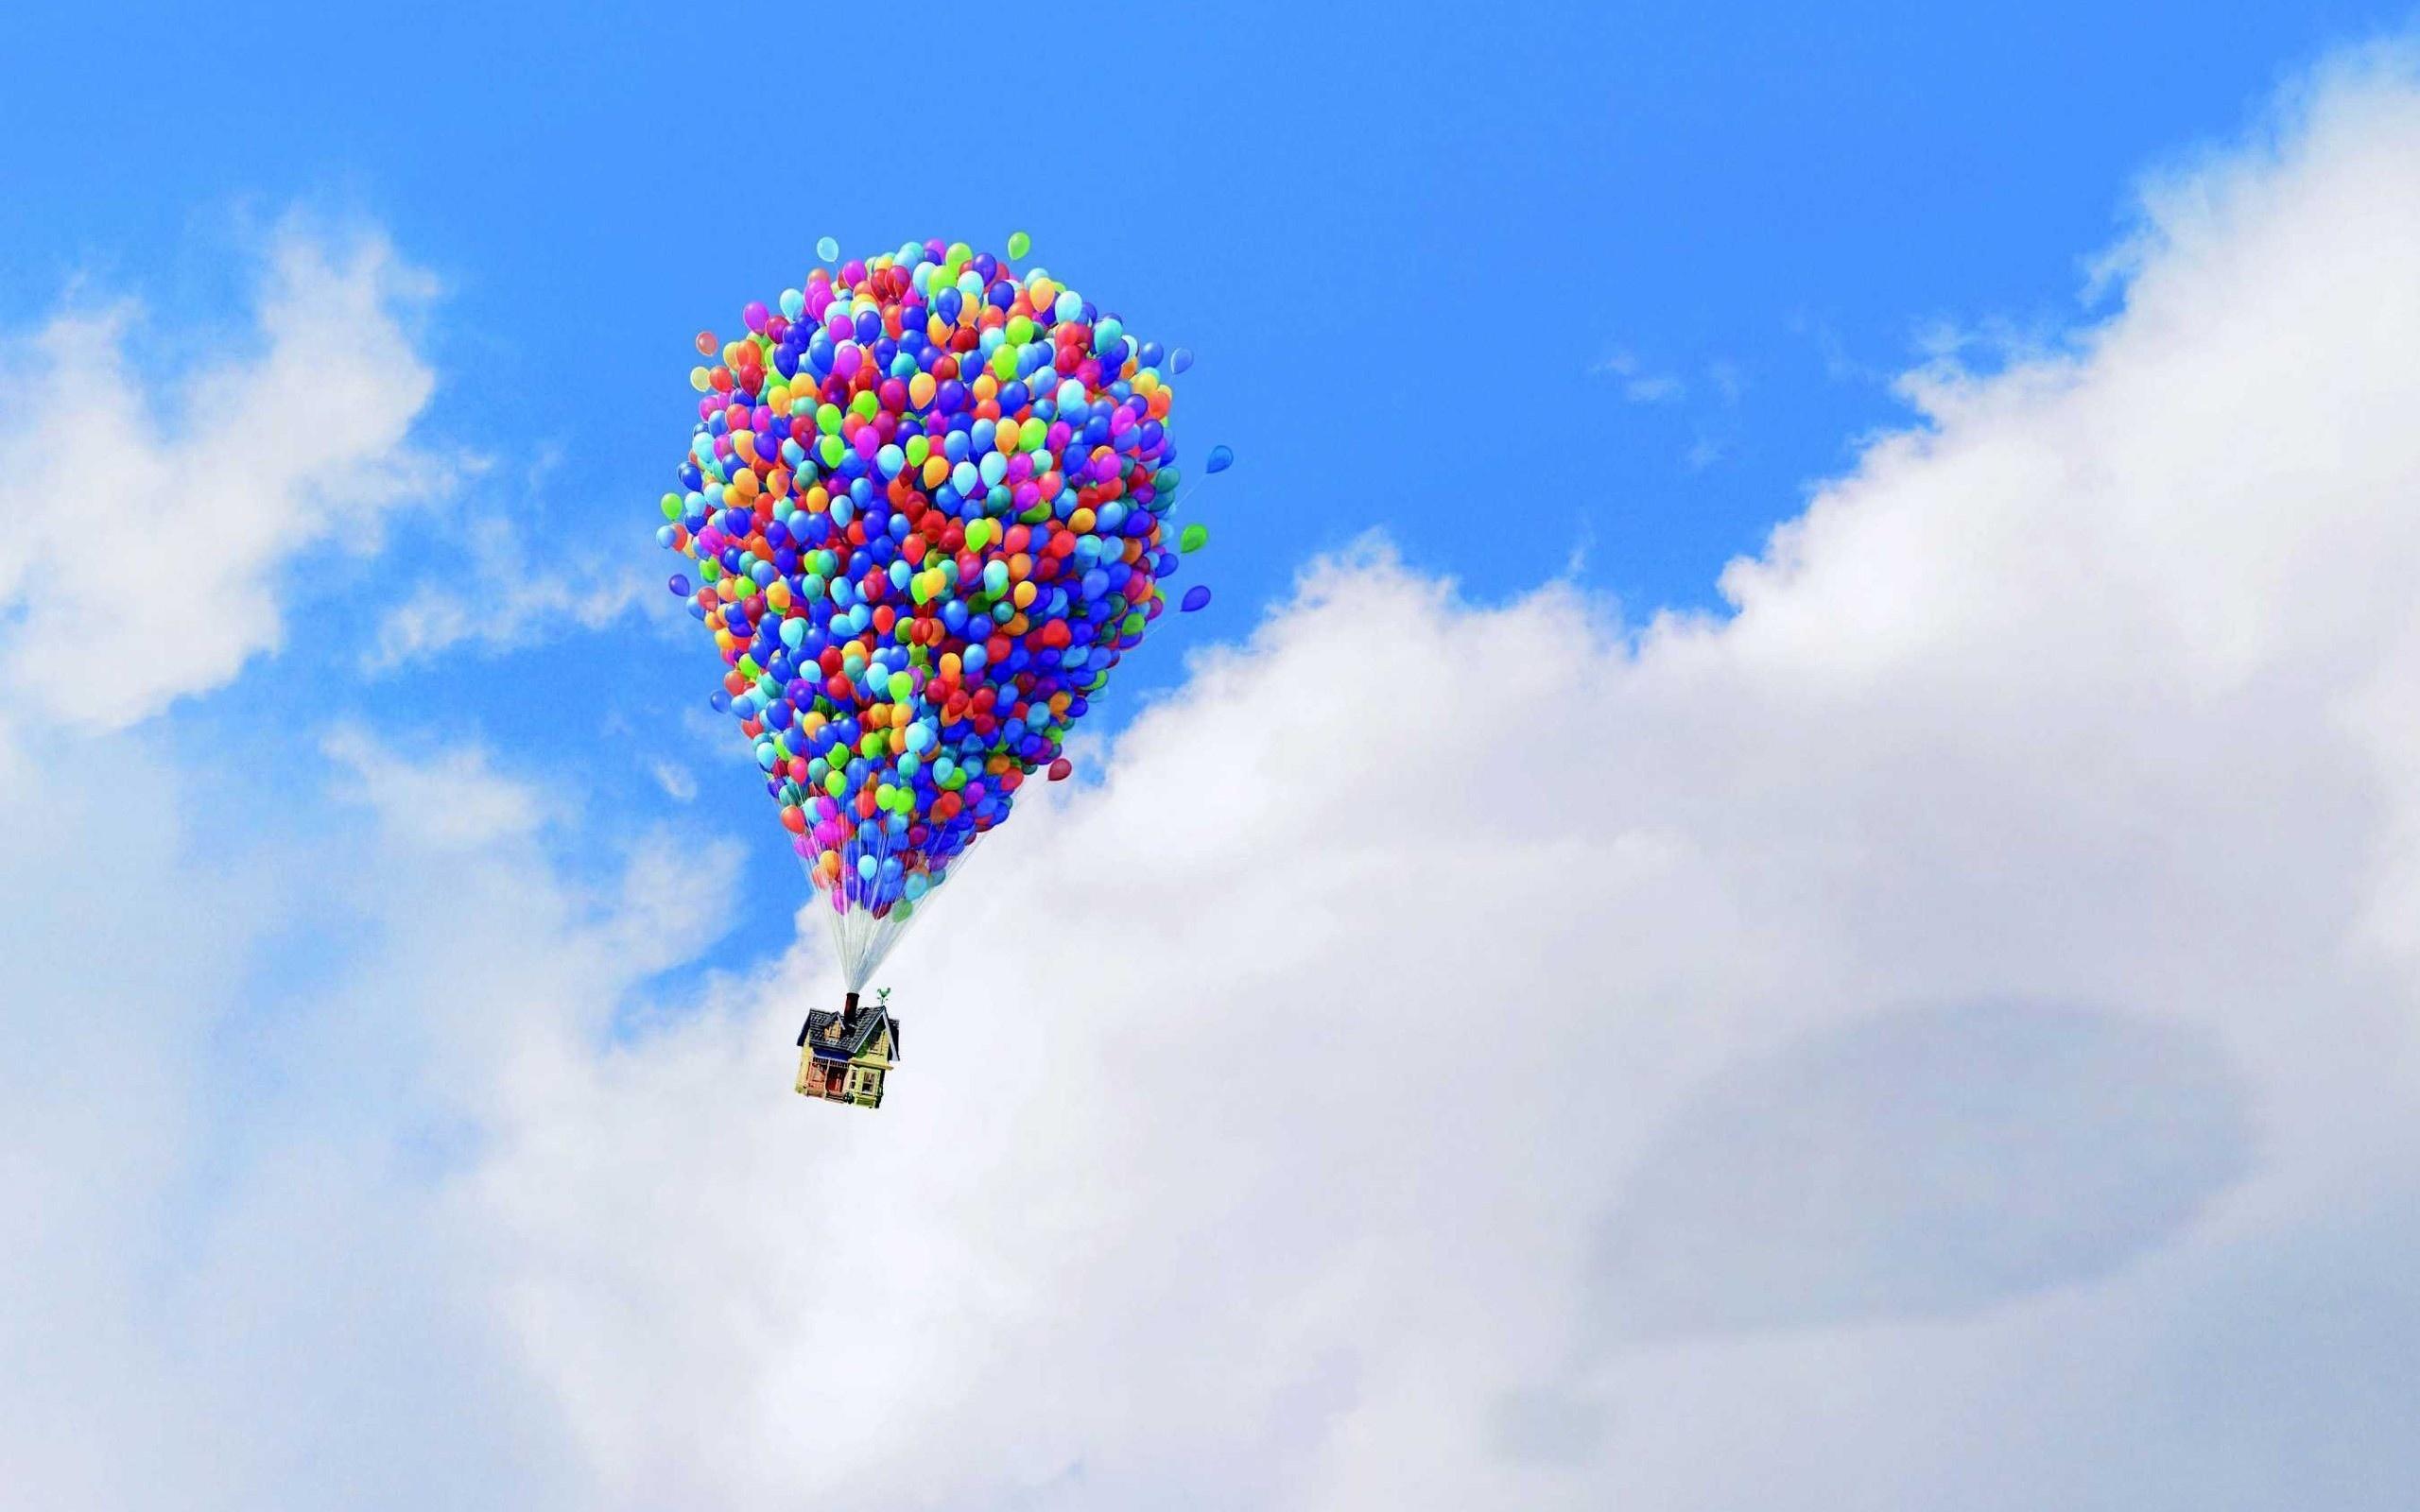 Up Wallpaper Up pixar Pixar animation balloons house sky 2560x1600